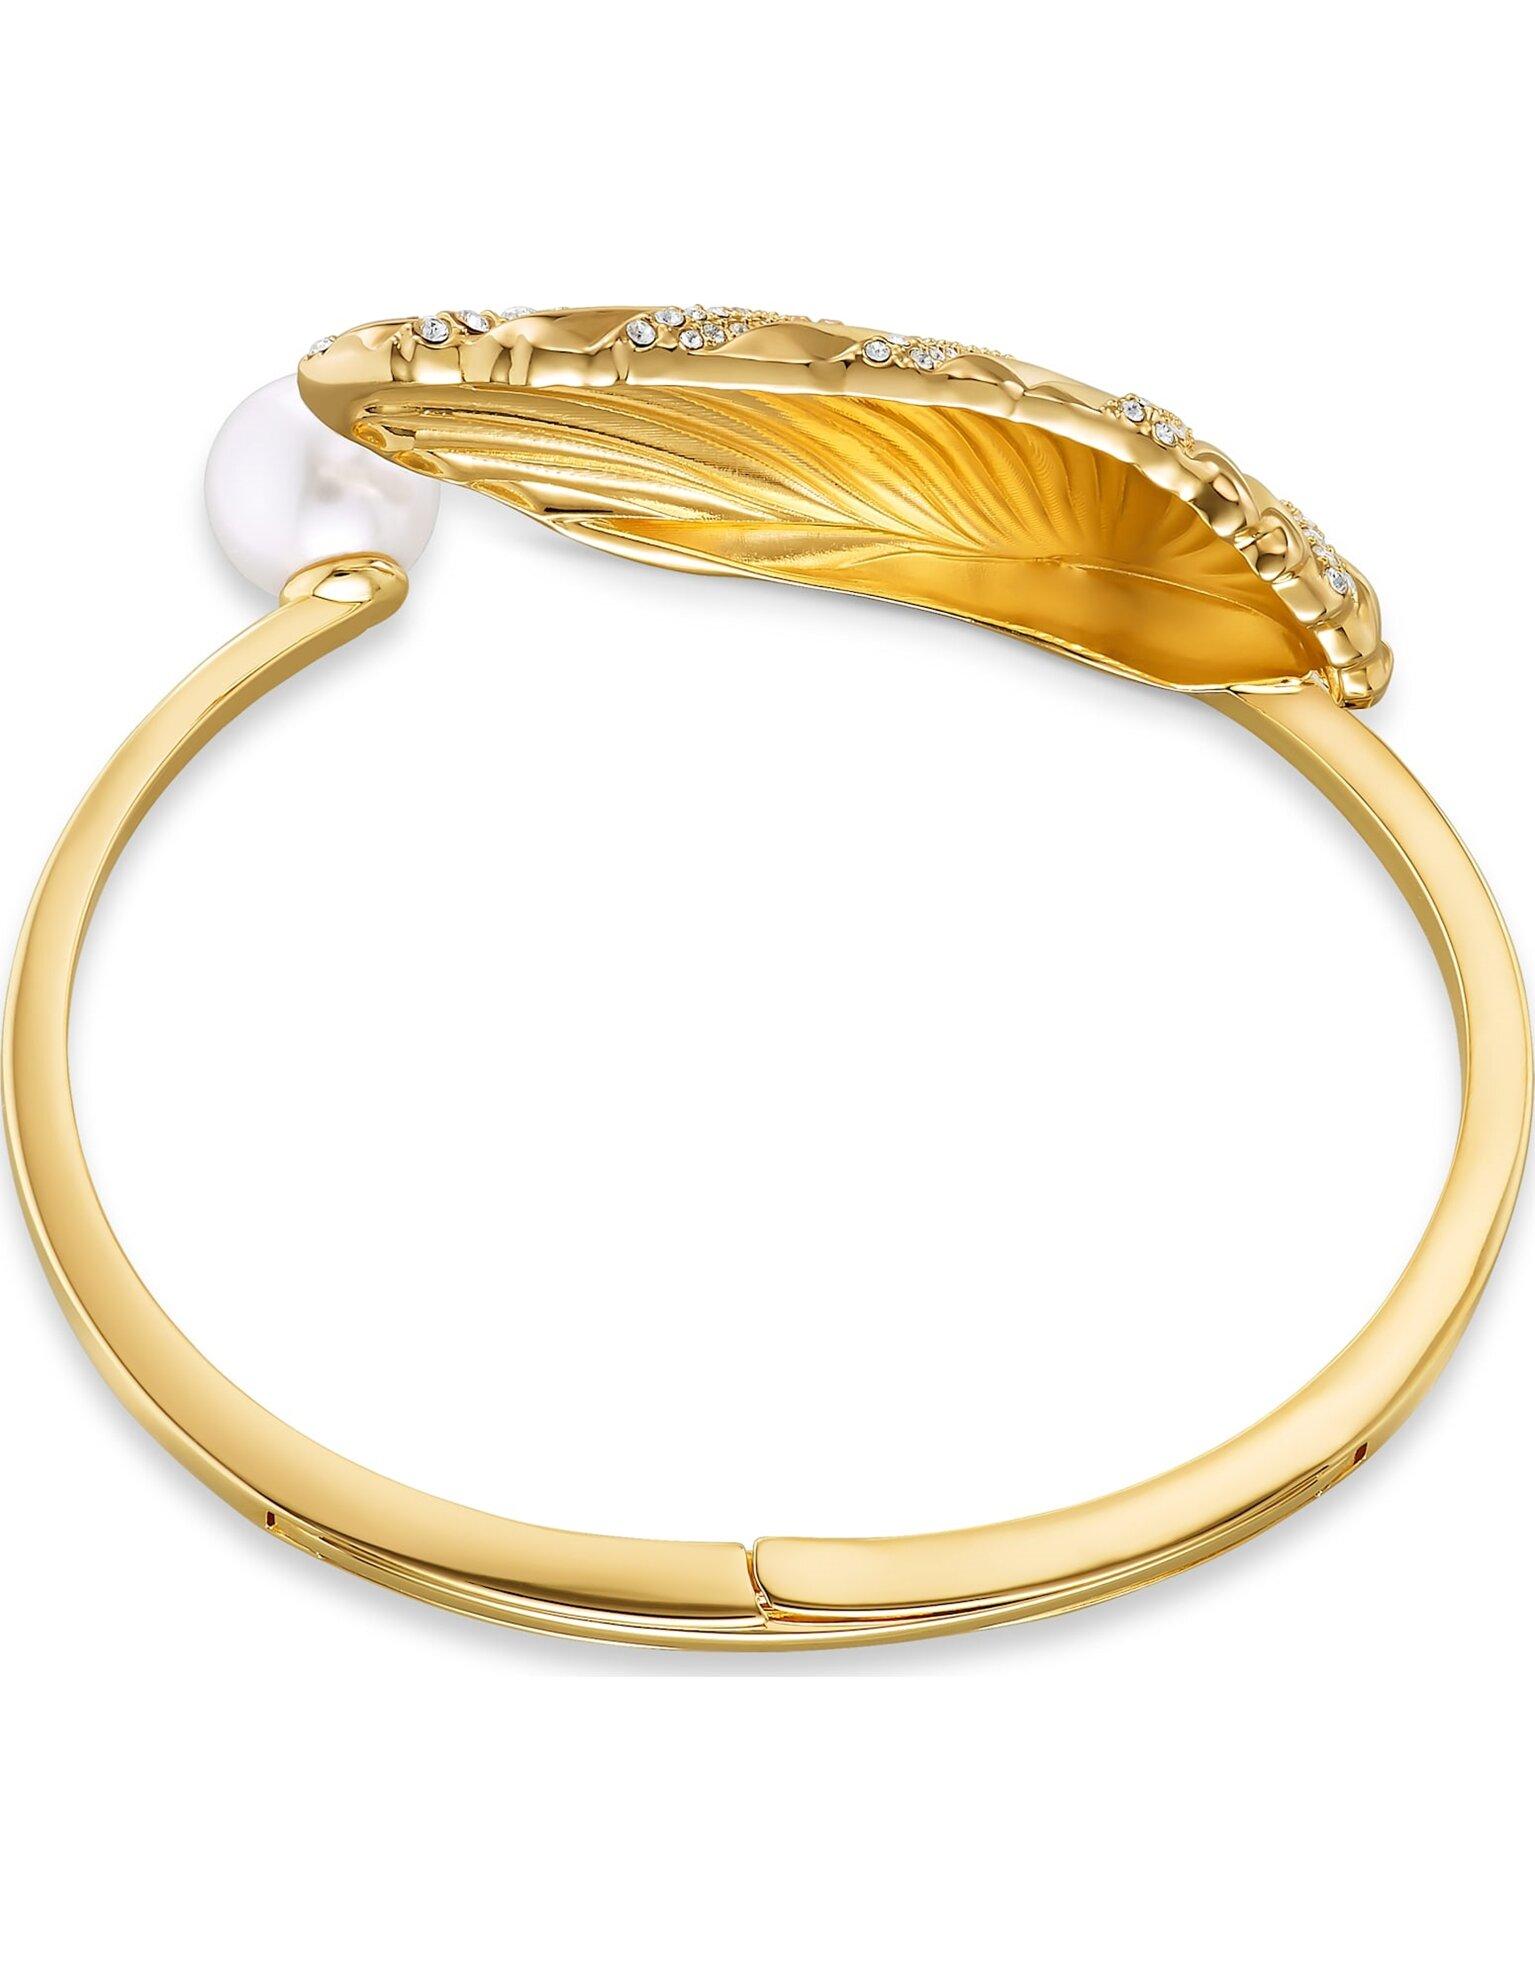 Picture of Shell Kelepçe, Açık renkli, Altın rengi kaplama